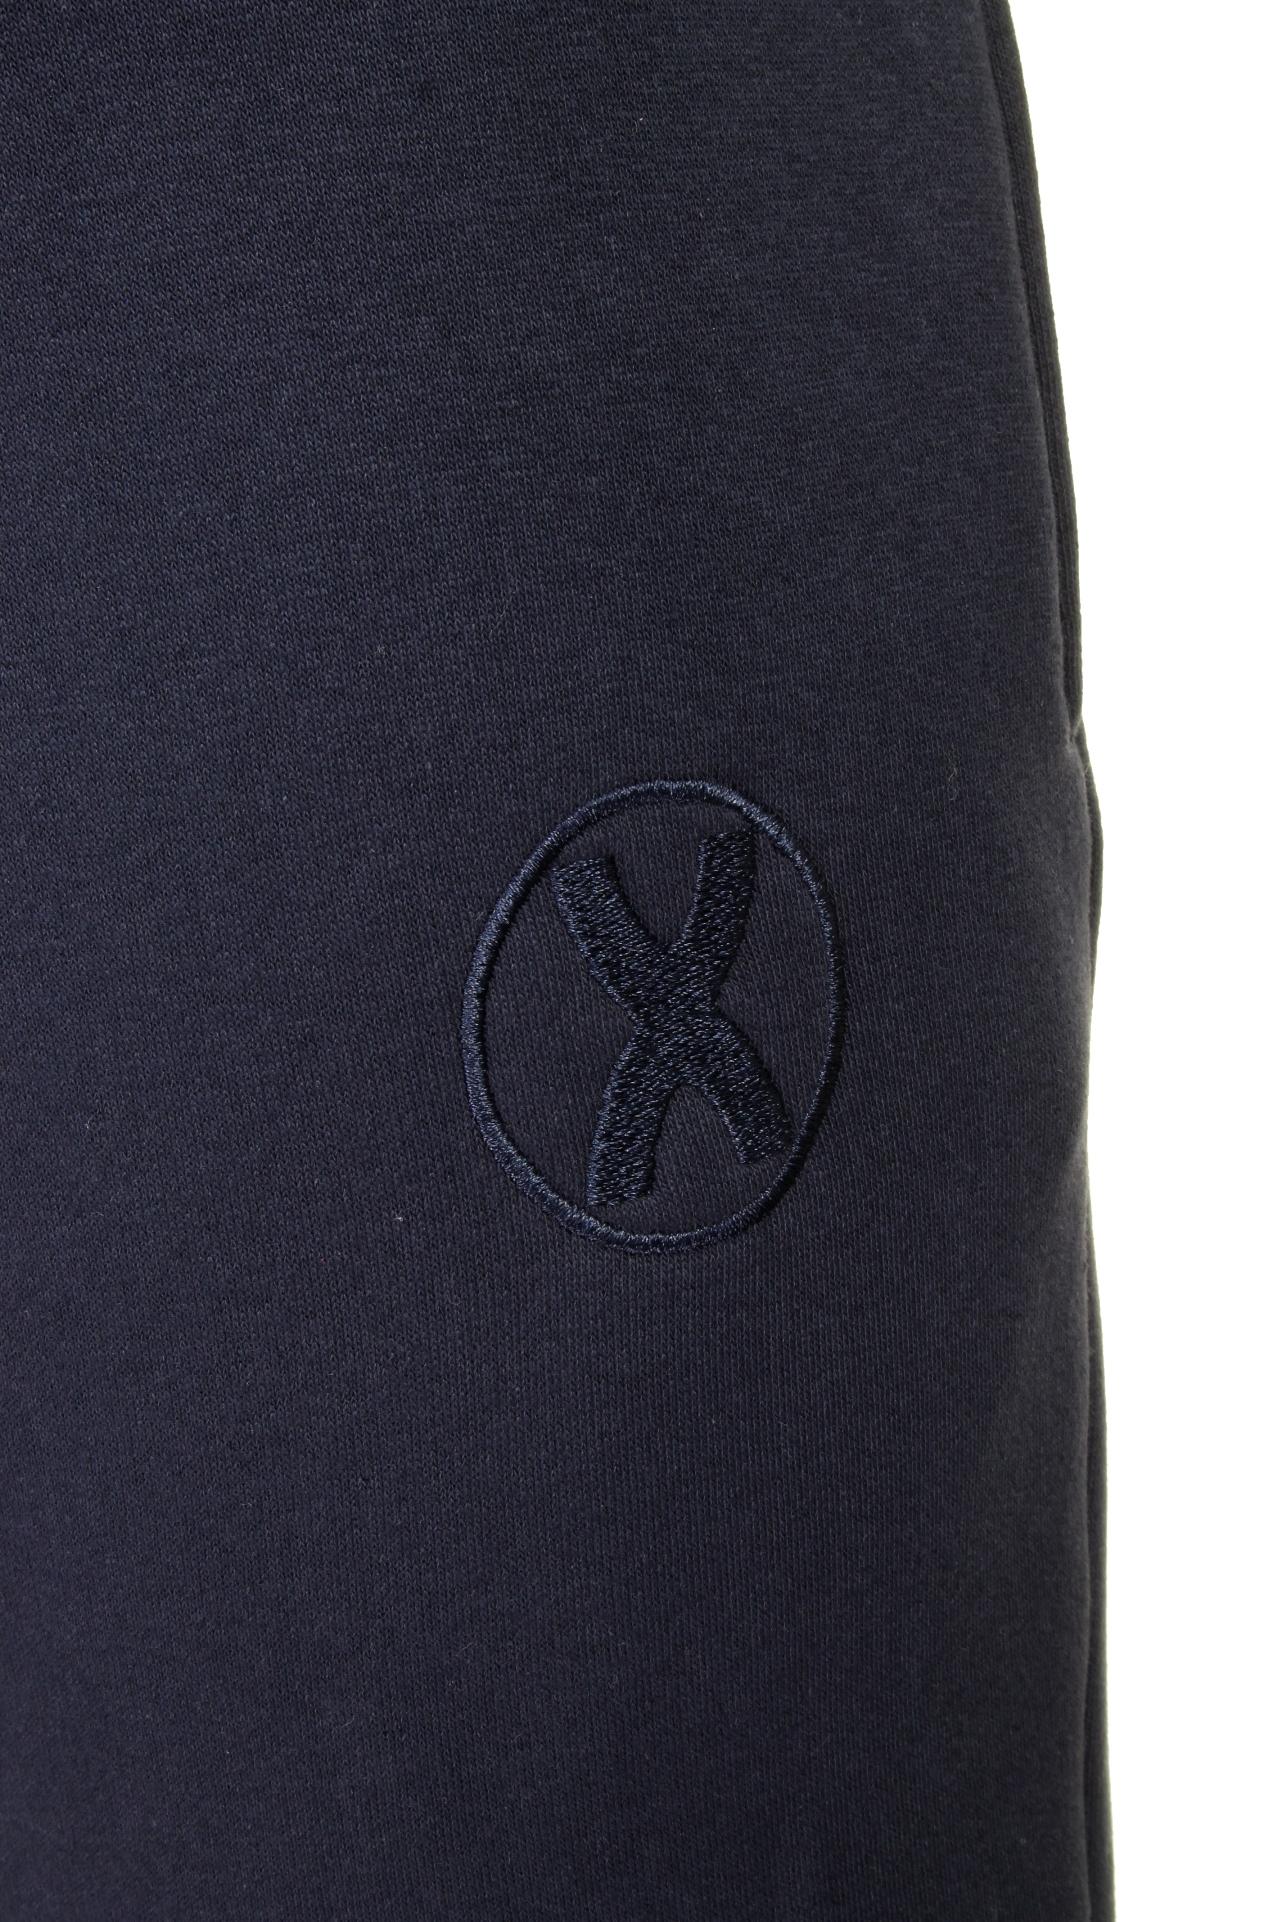 Mens-Xact-Slim-Fit-Joggers thumbnail 19